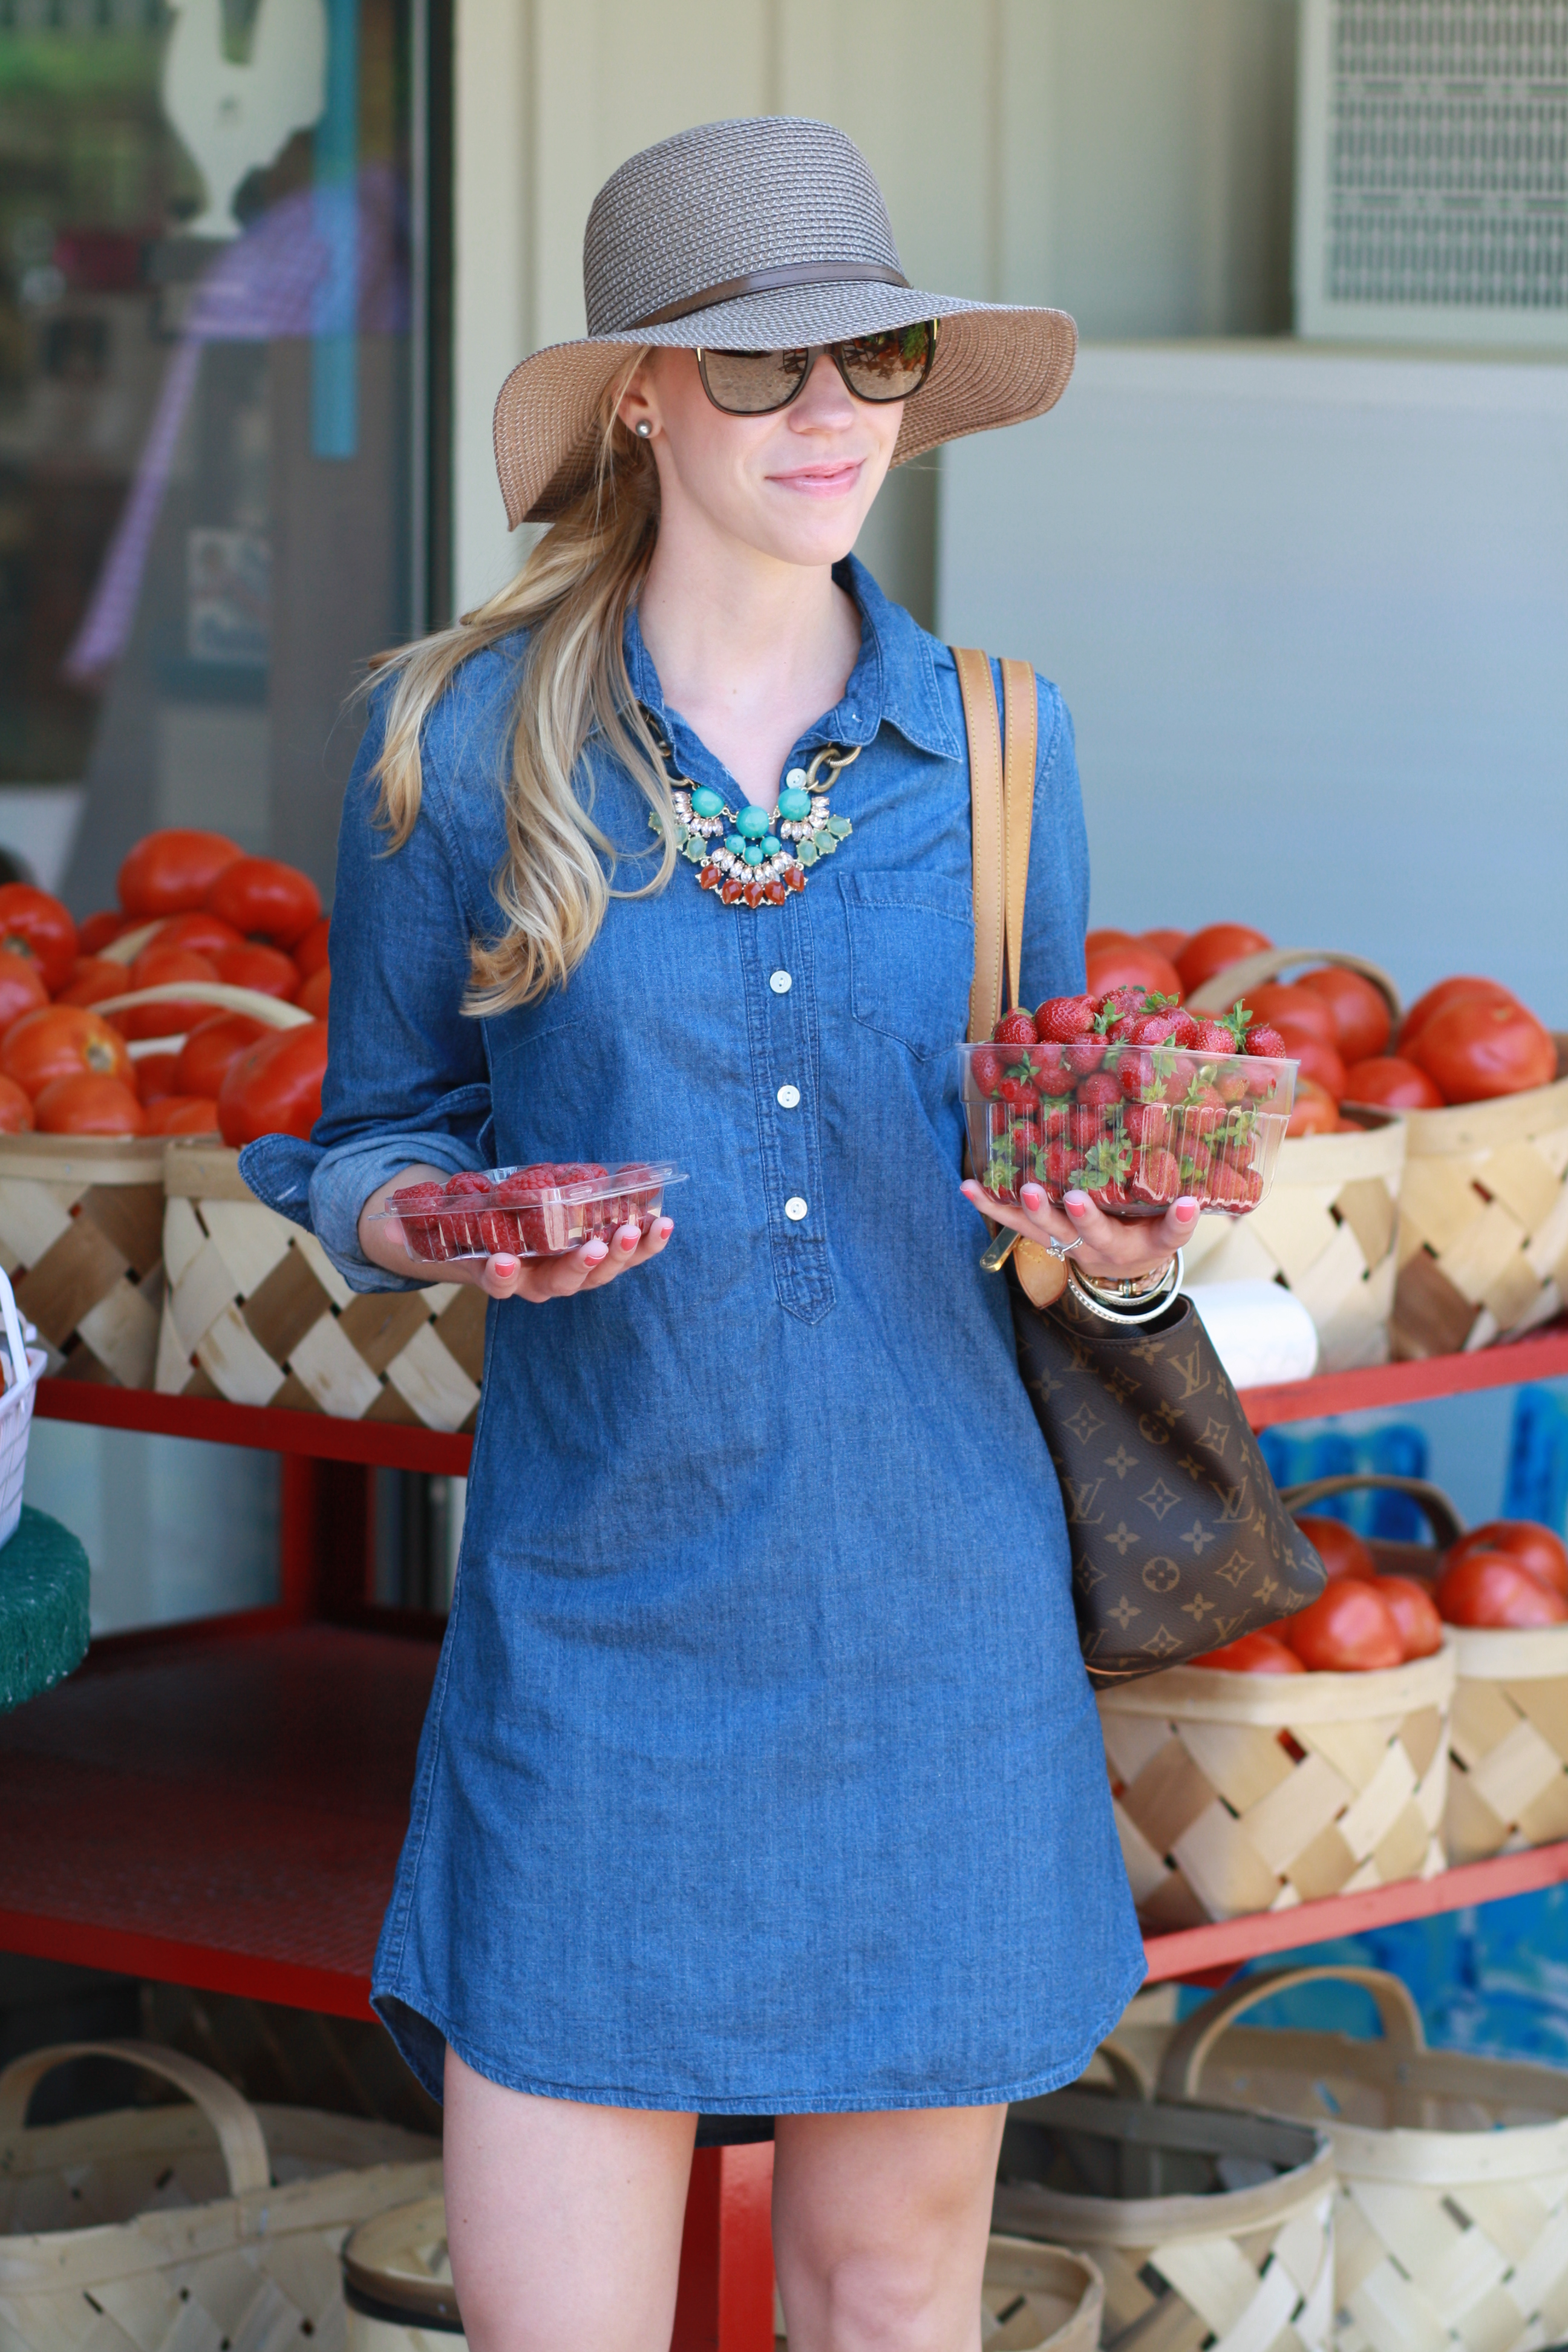 8096055aca70b5 brown floppy straw hat, chambray denim shirt dress, turquoise coral  statement necklace, Prada sunglasses